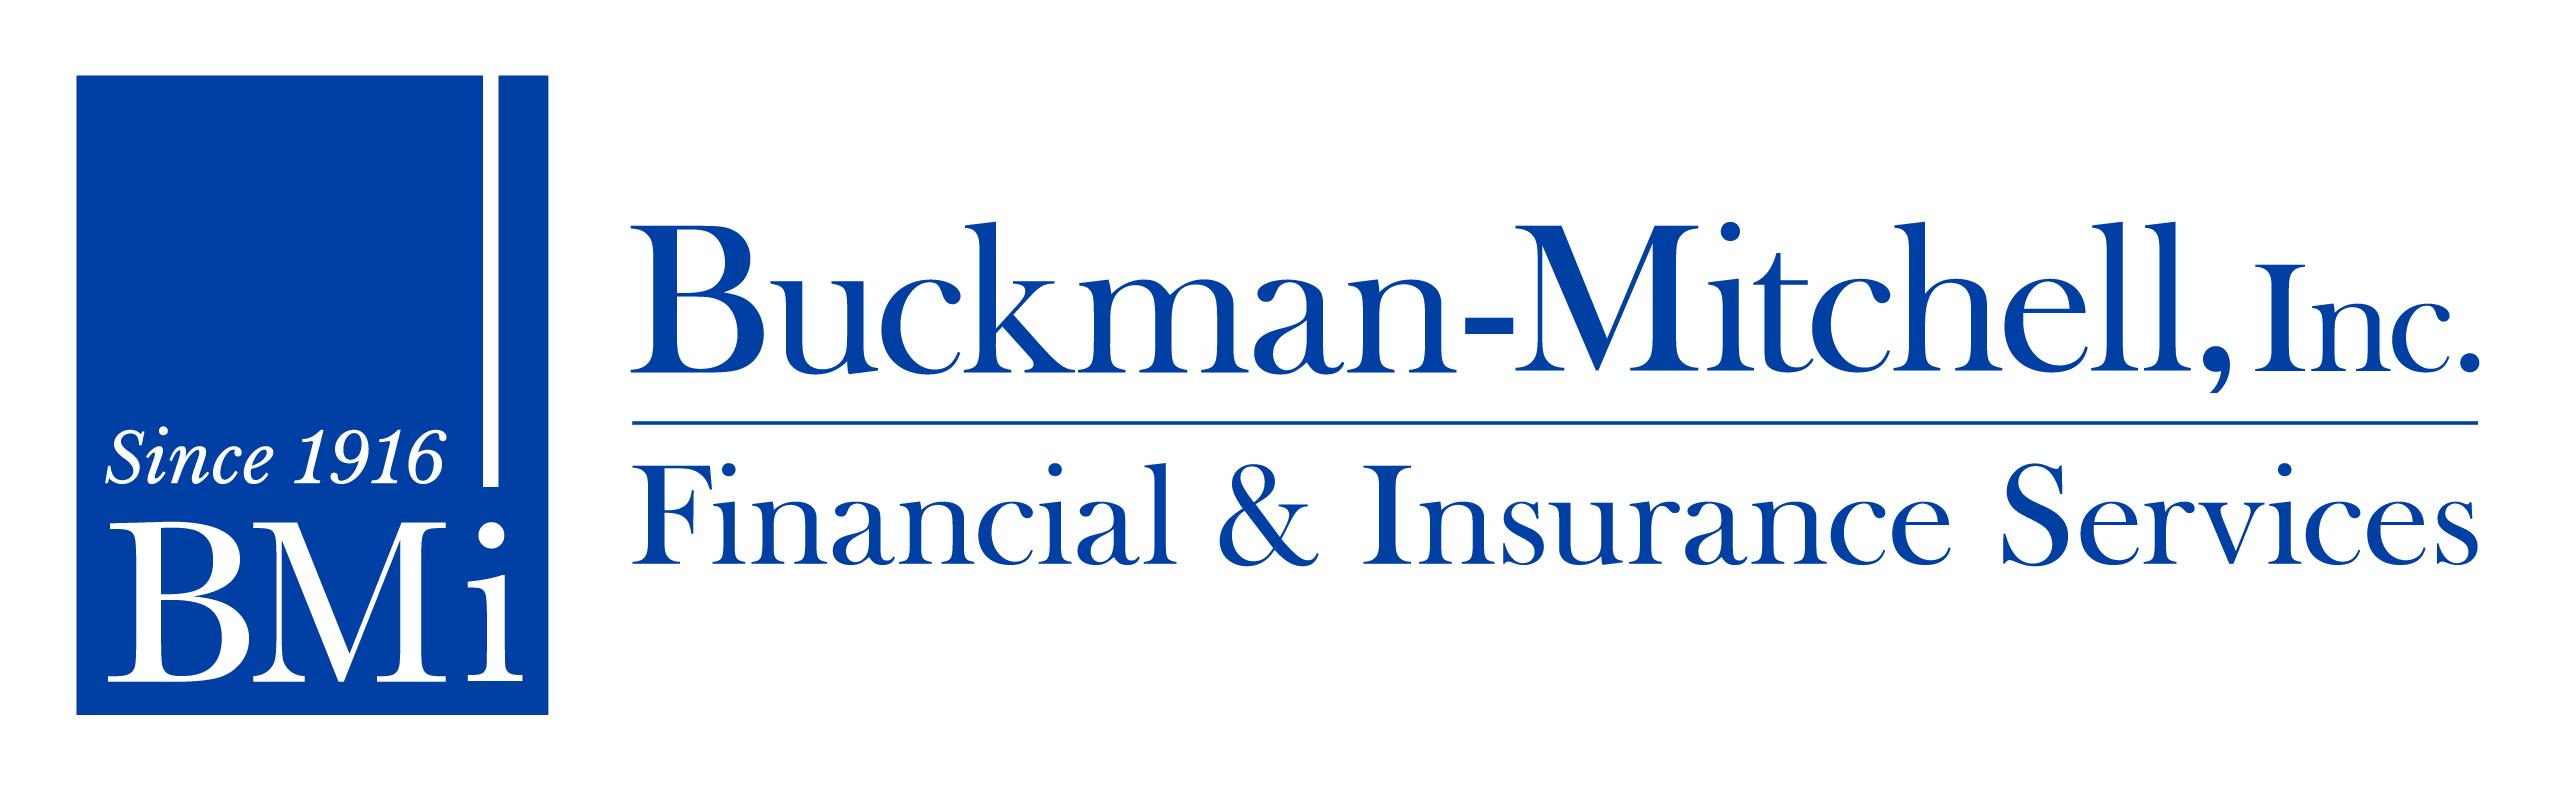 Buckman Mitchell Insurance Inc 500 N Santa Fe St Visalia